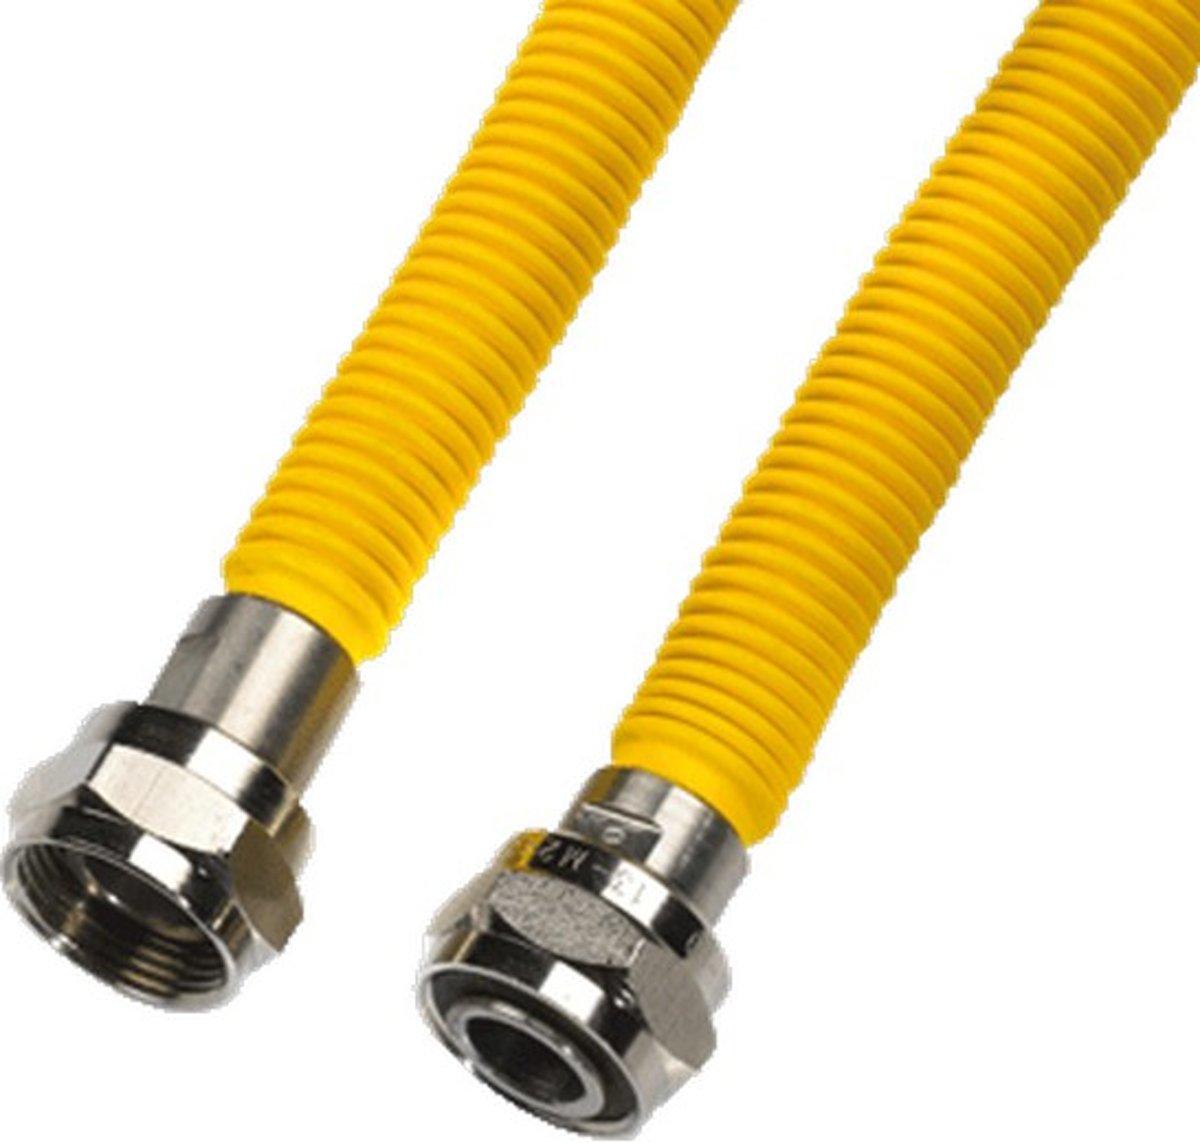 VSH gasslang A1070, M24/1.5mm, le 1.2m, diam 19mm, slang RVS kopen